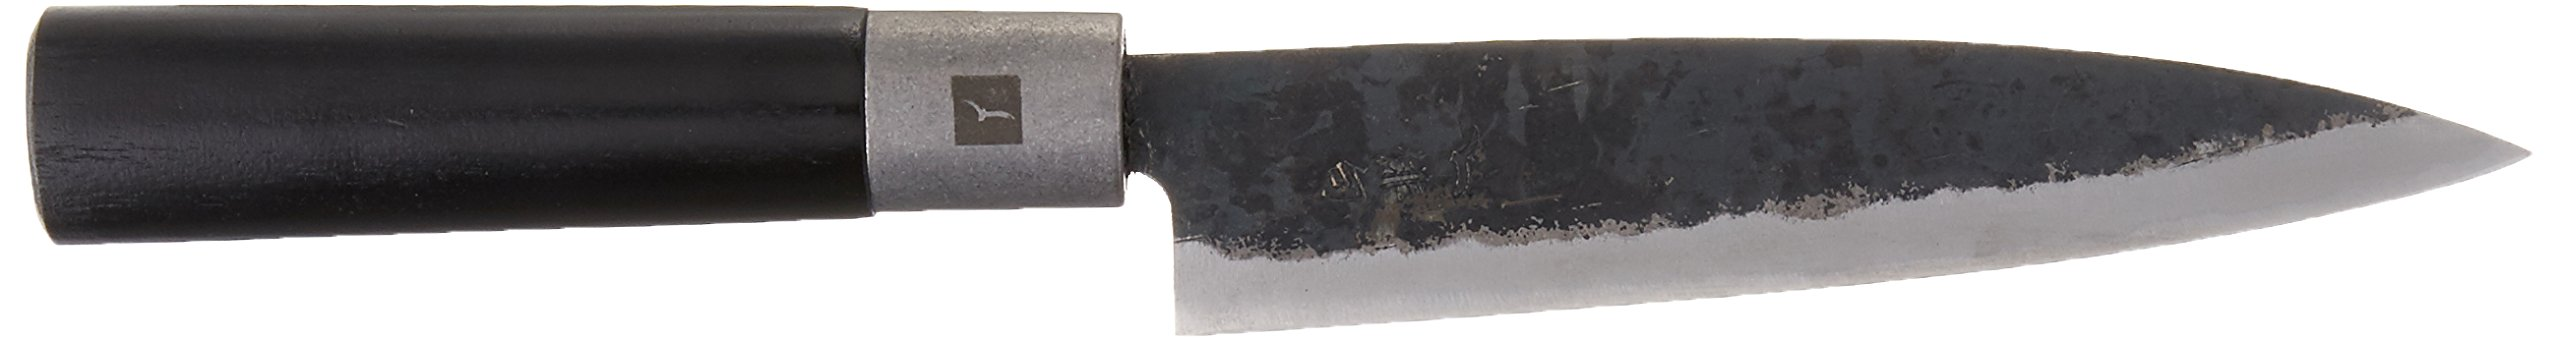 Haiku Kurouchi B07 KO-Yanagi Knife, 6 3/4-Inch, one size, Steel